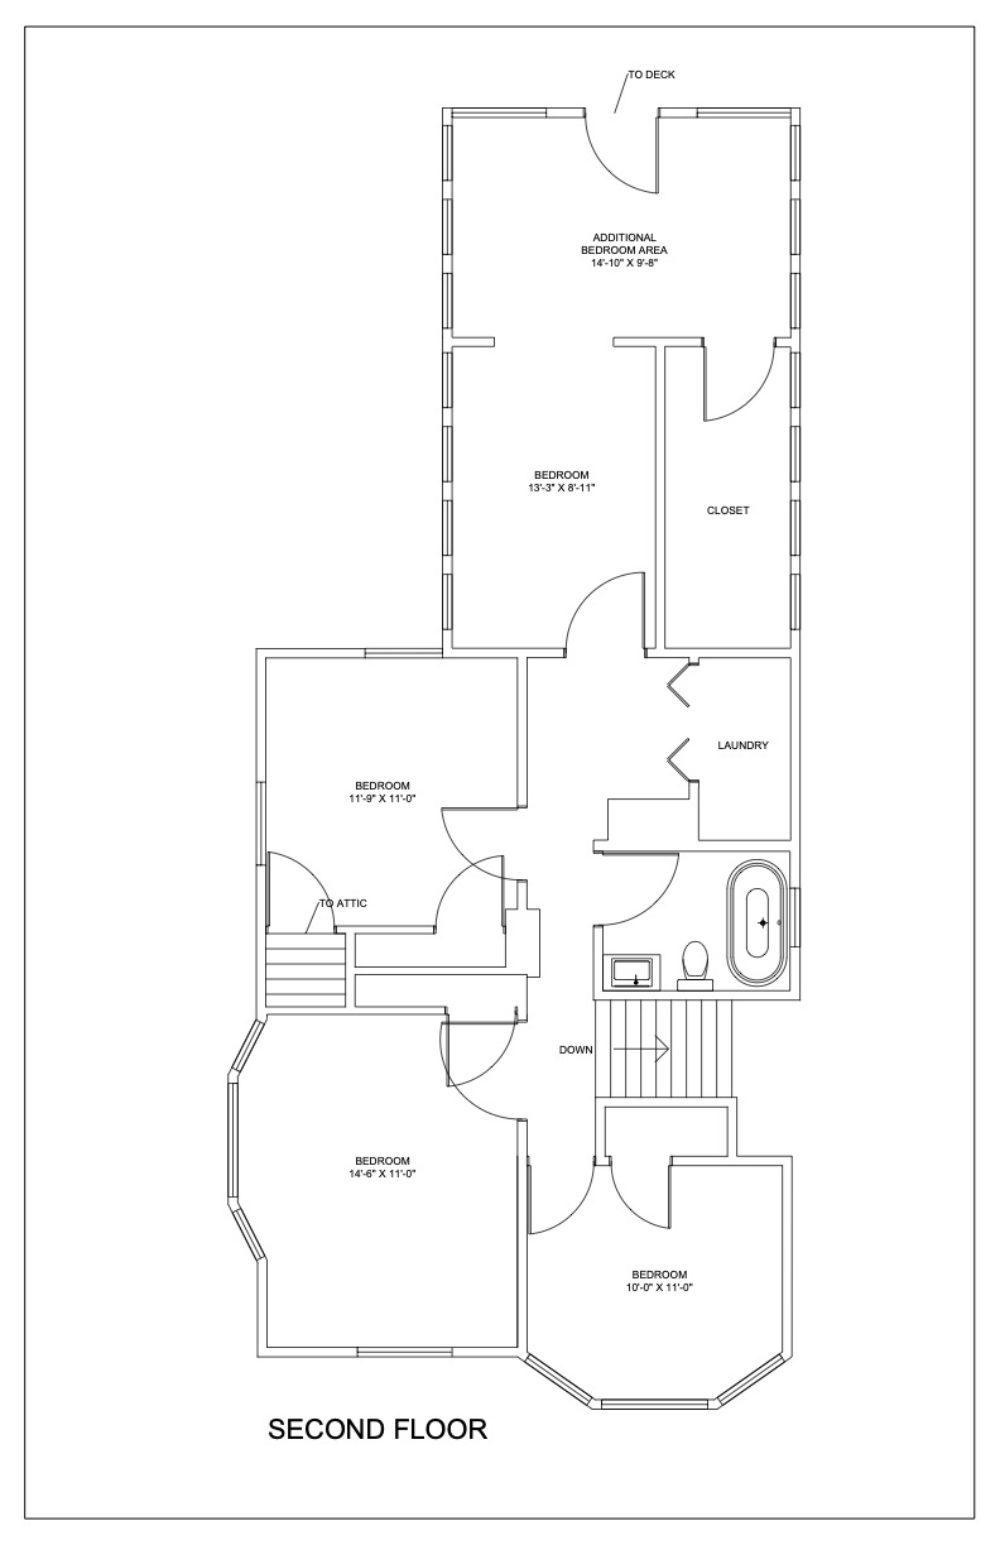 210815 712 Initiative Housing Revitalization 710 Bluff Street Second Floor copy